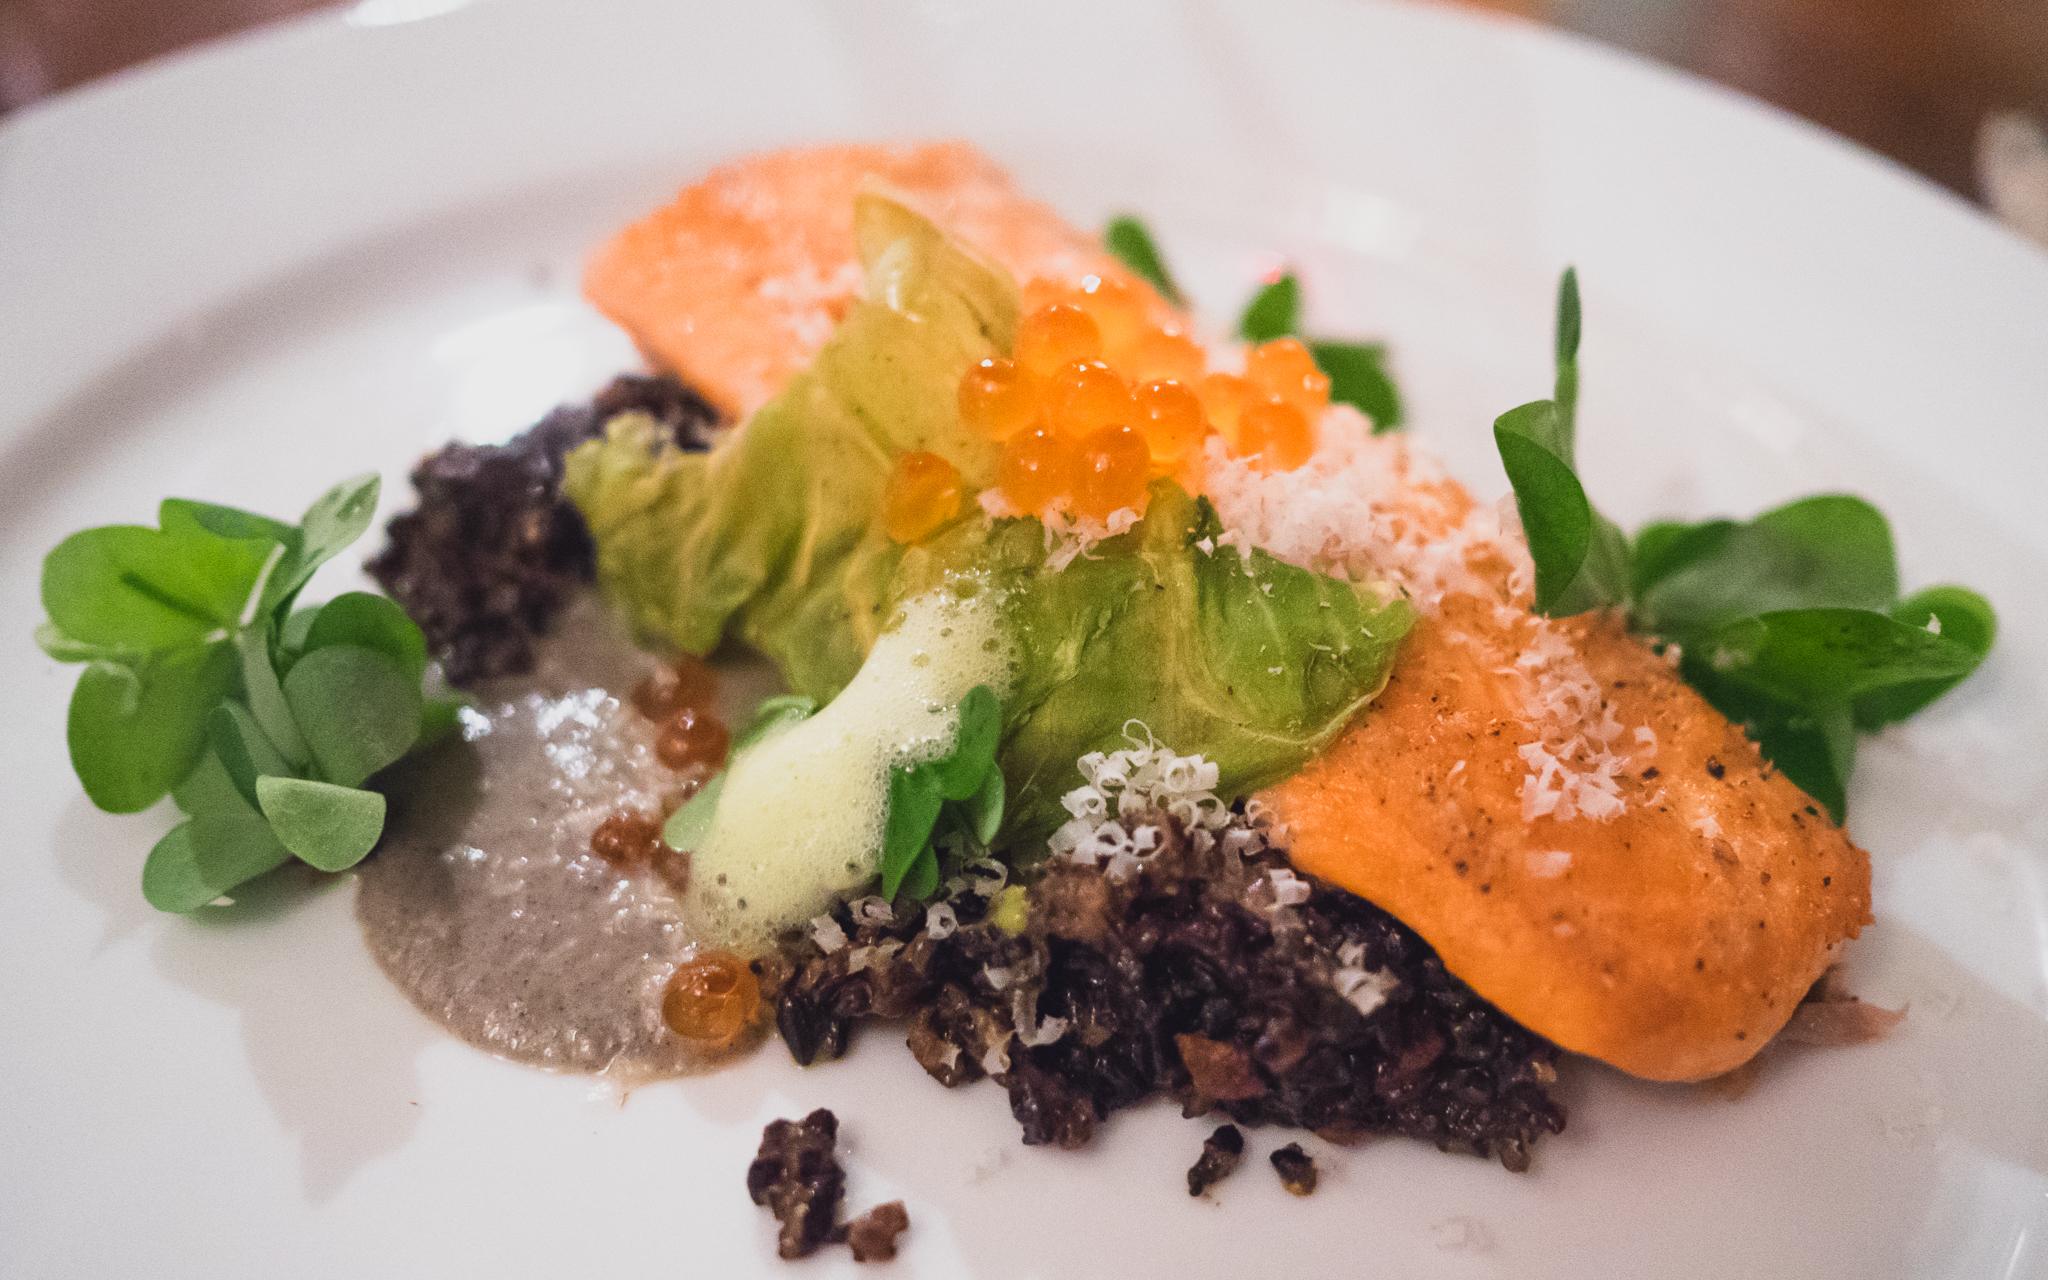 local steelhead, forbidden rice salad, cabbage chip, charred eggplant, roe.